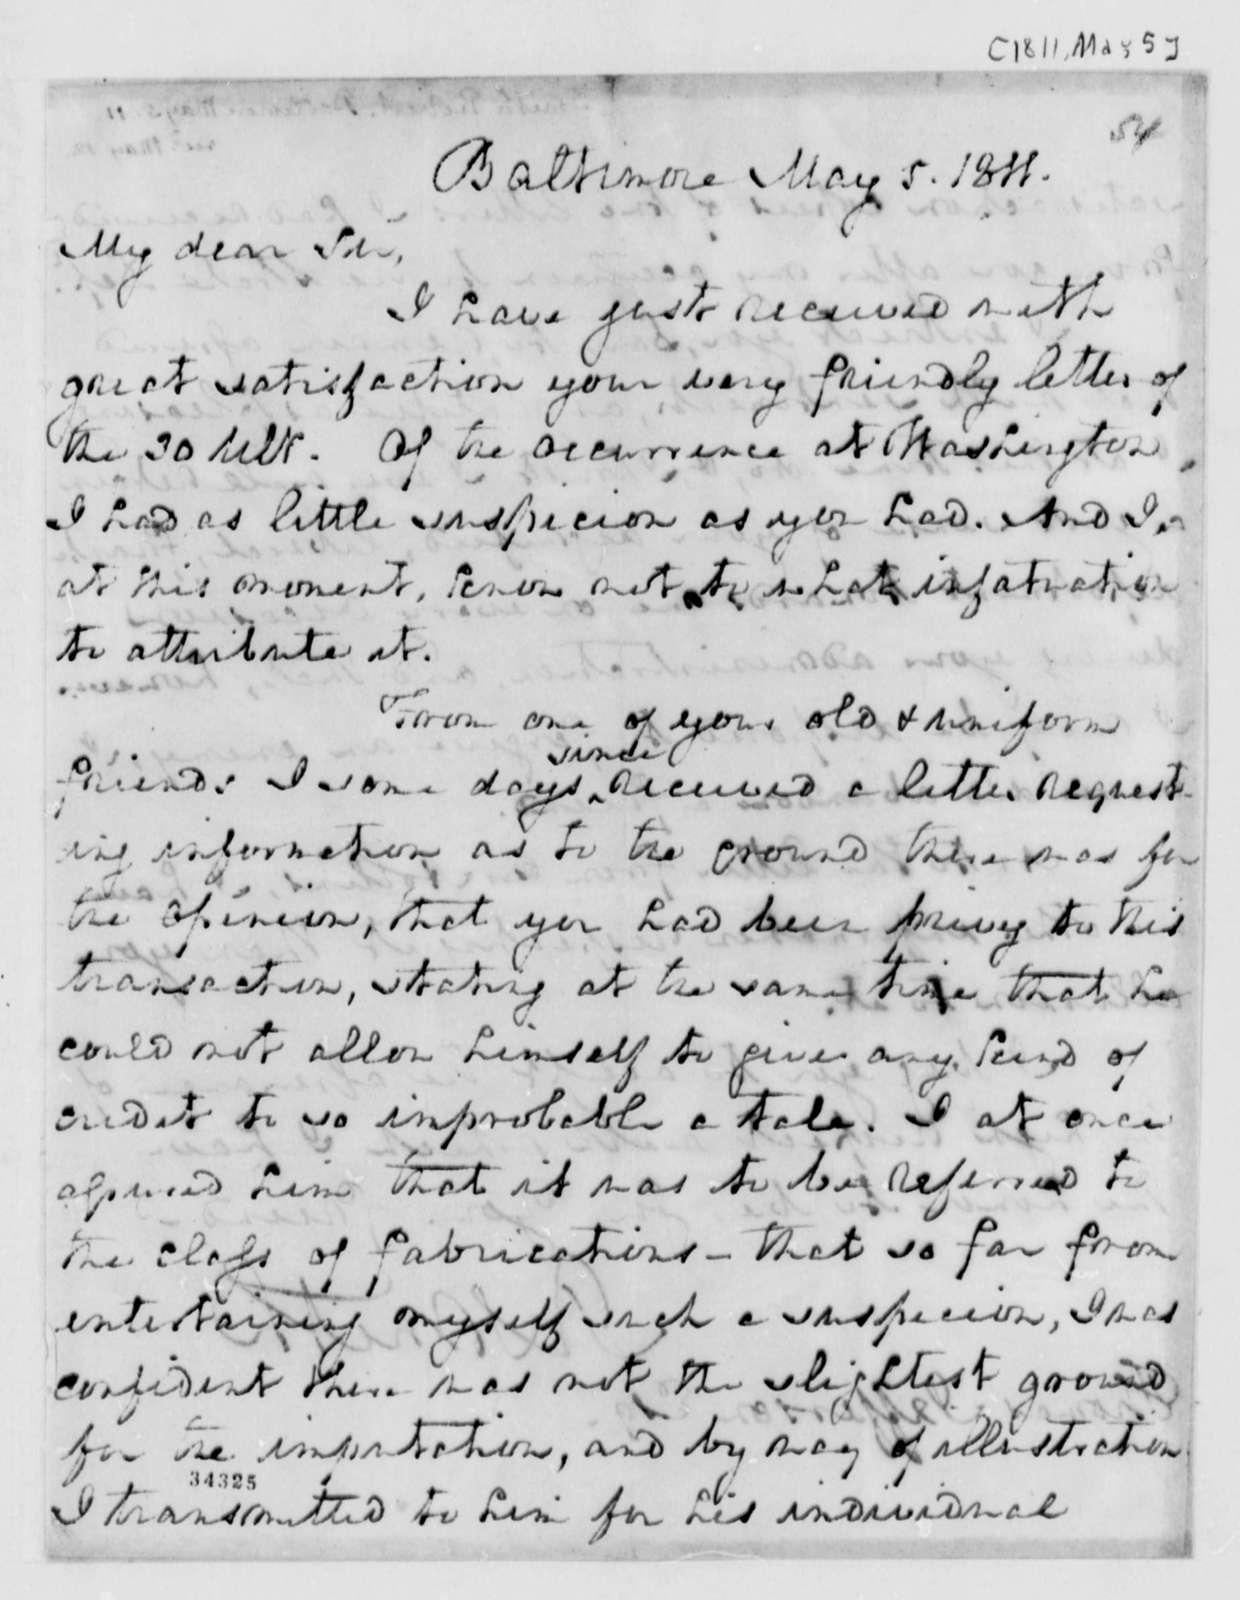 Robert Smith to Thomas Jefferson, May 5, 1811